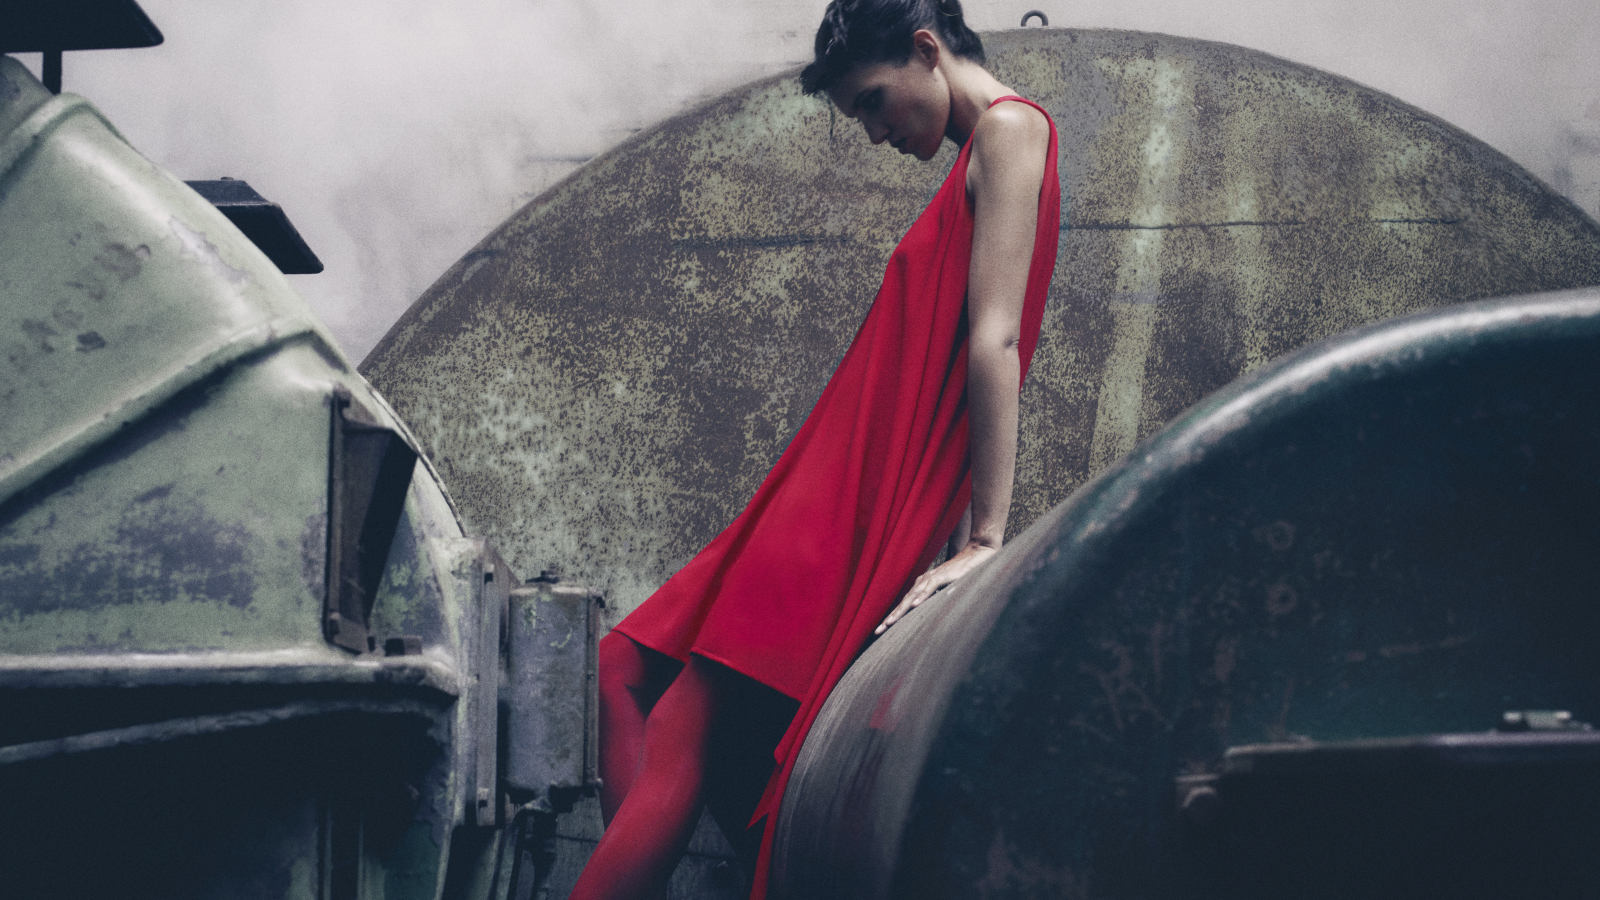 Virgin Voyages Reveals Crew Uniforms by British Designer Gareth Pugh at London Fashion Week